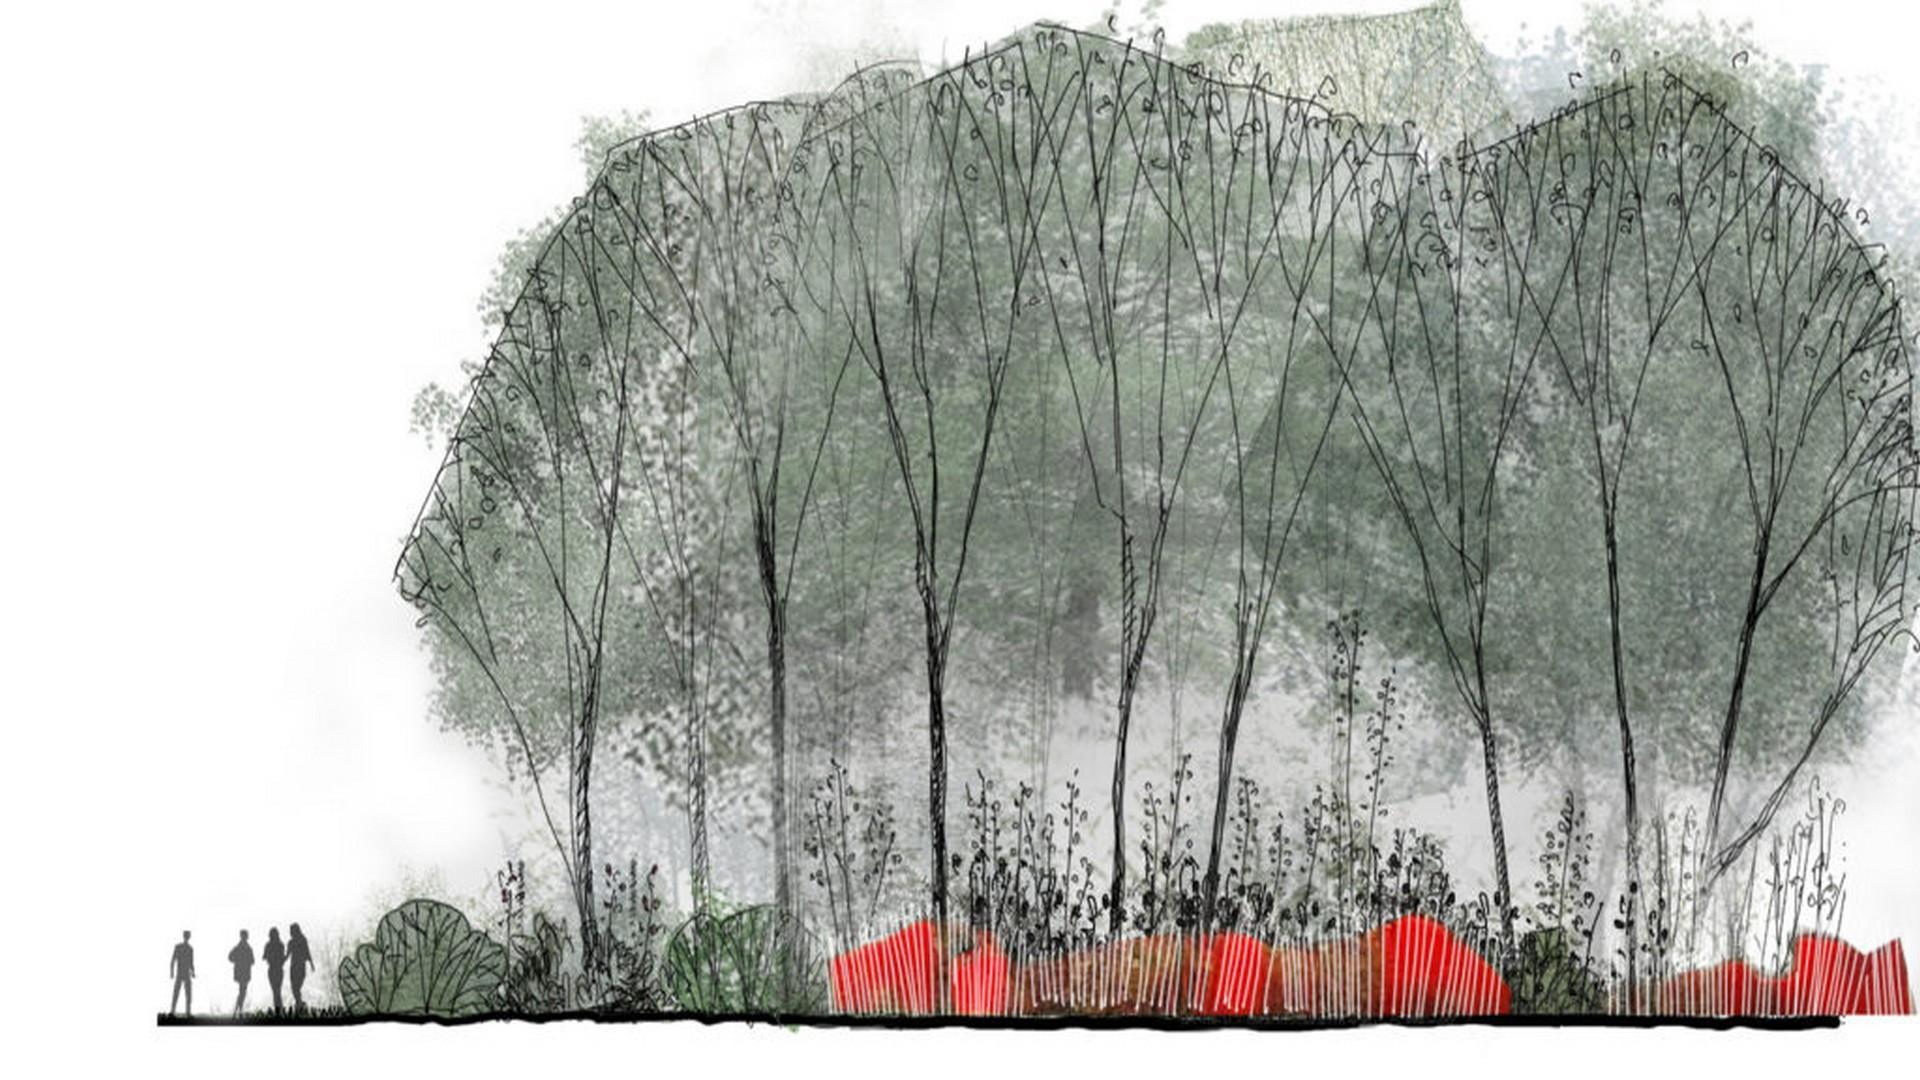 Jardin de 100 ans > French Garden of Peace, 2019